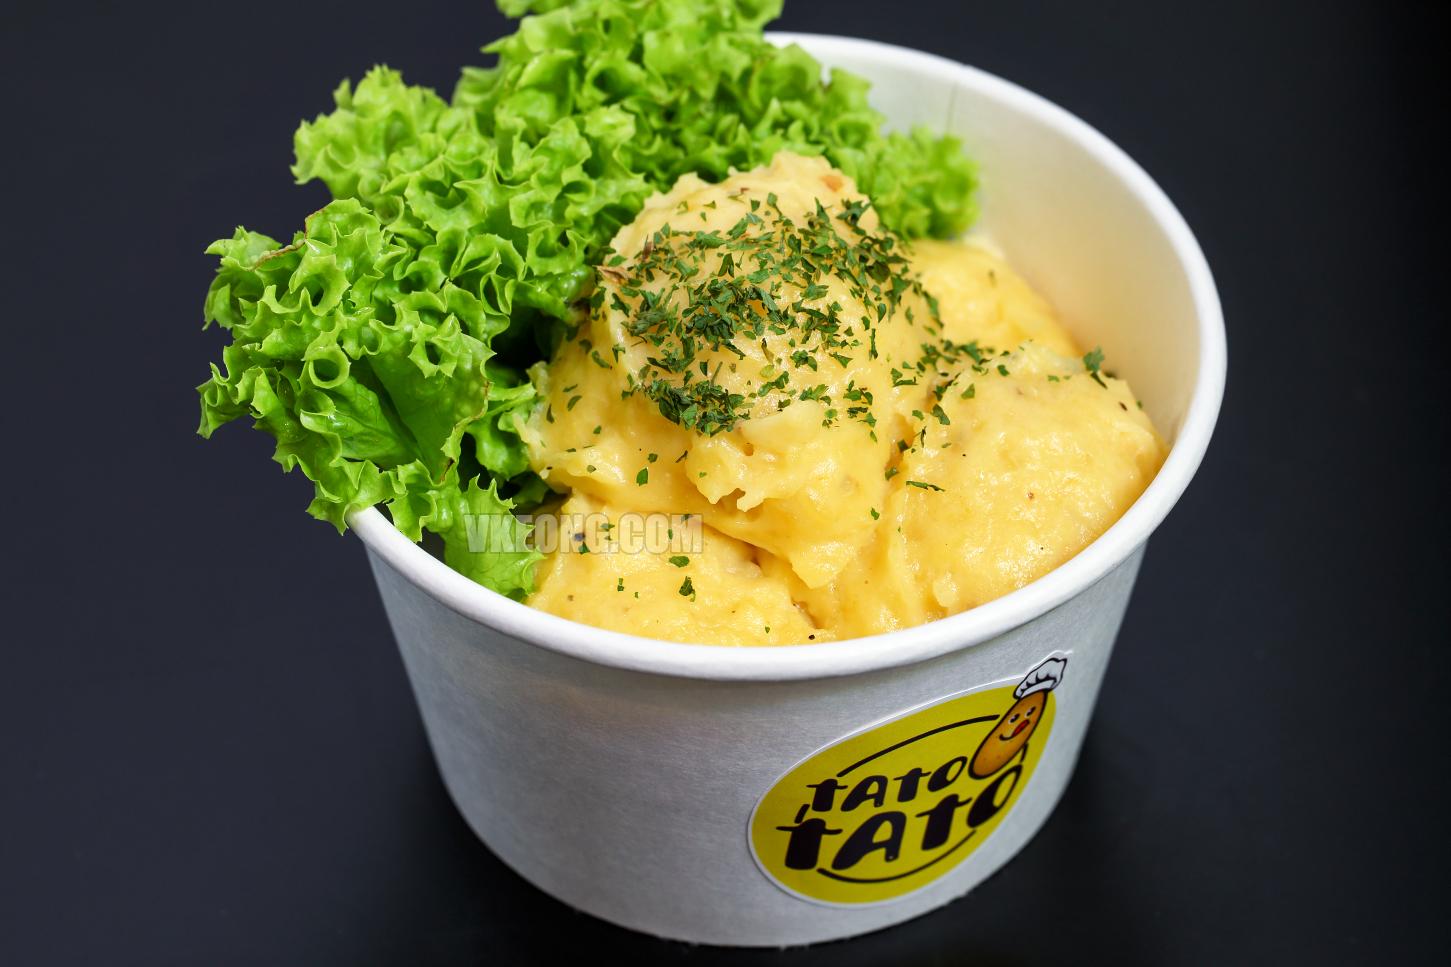 TatoTato-Classic-Original-Mashed-Potato